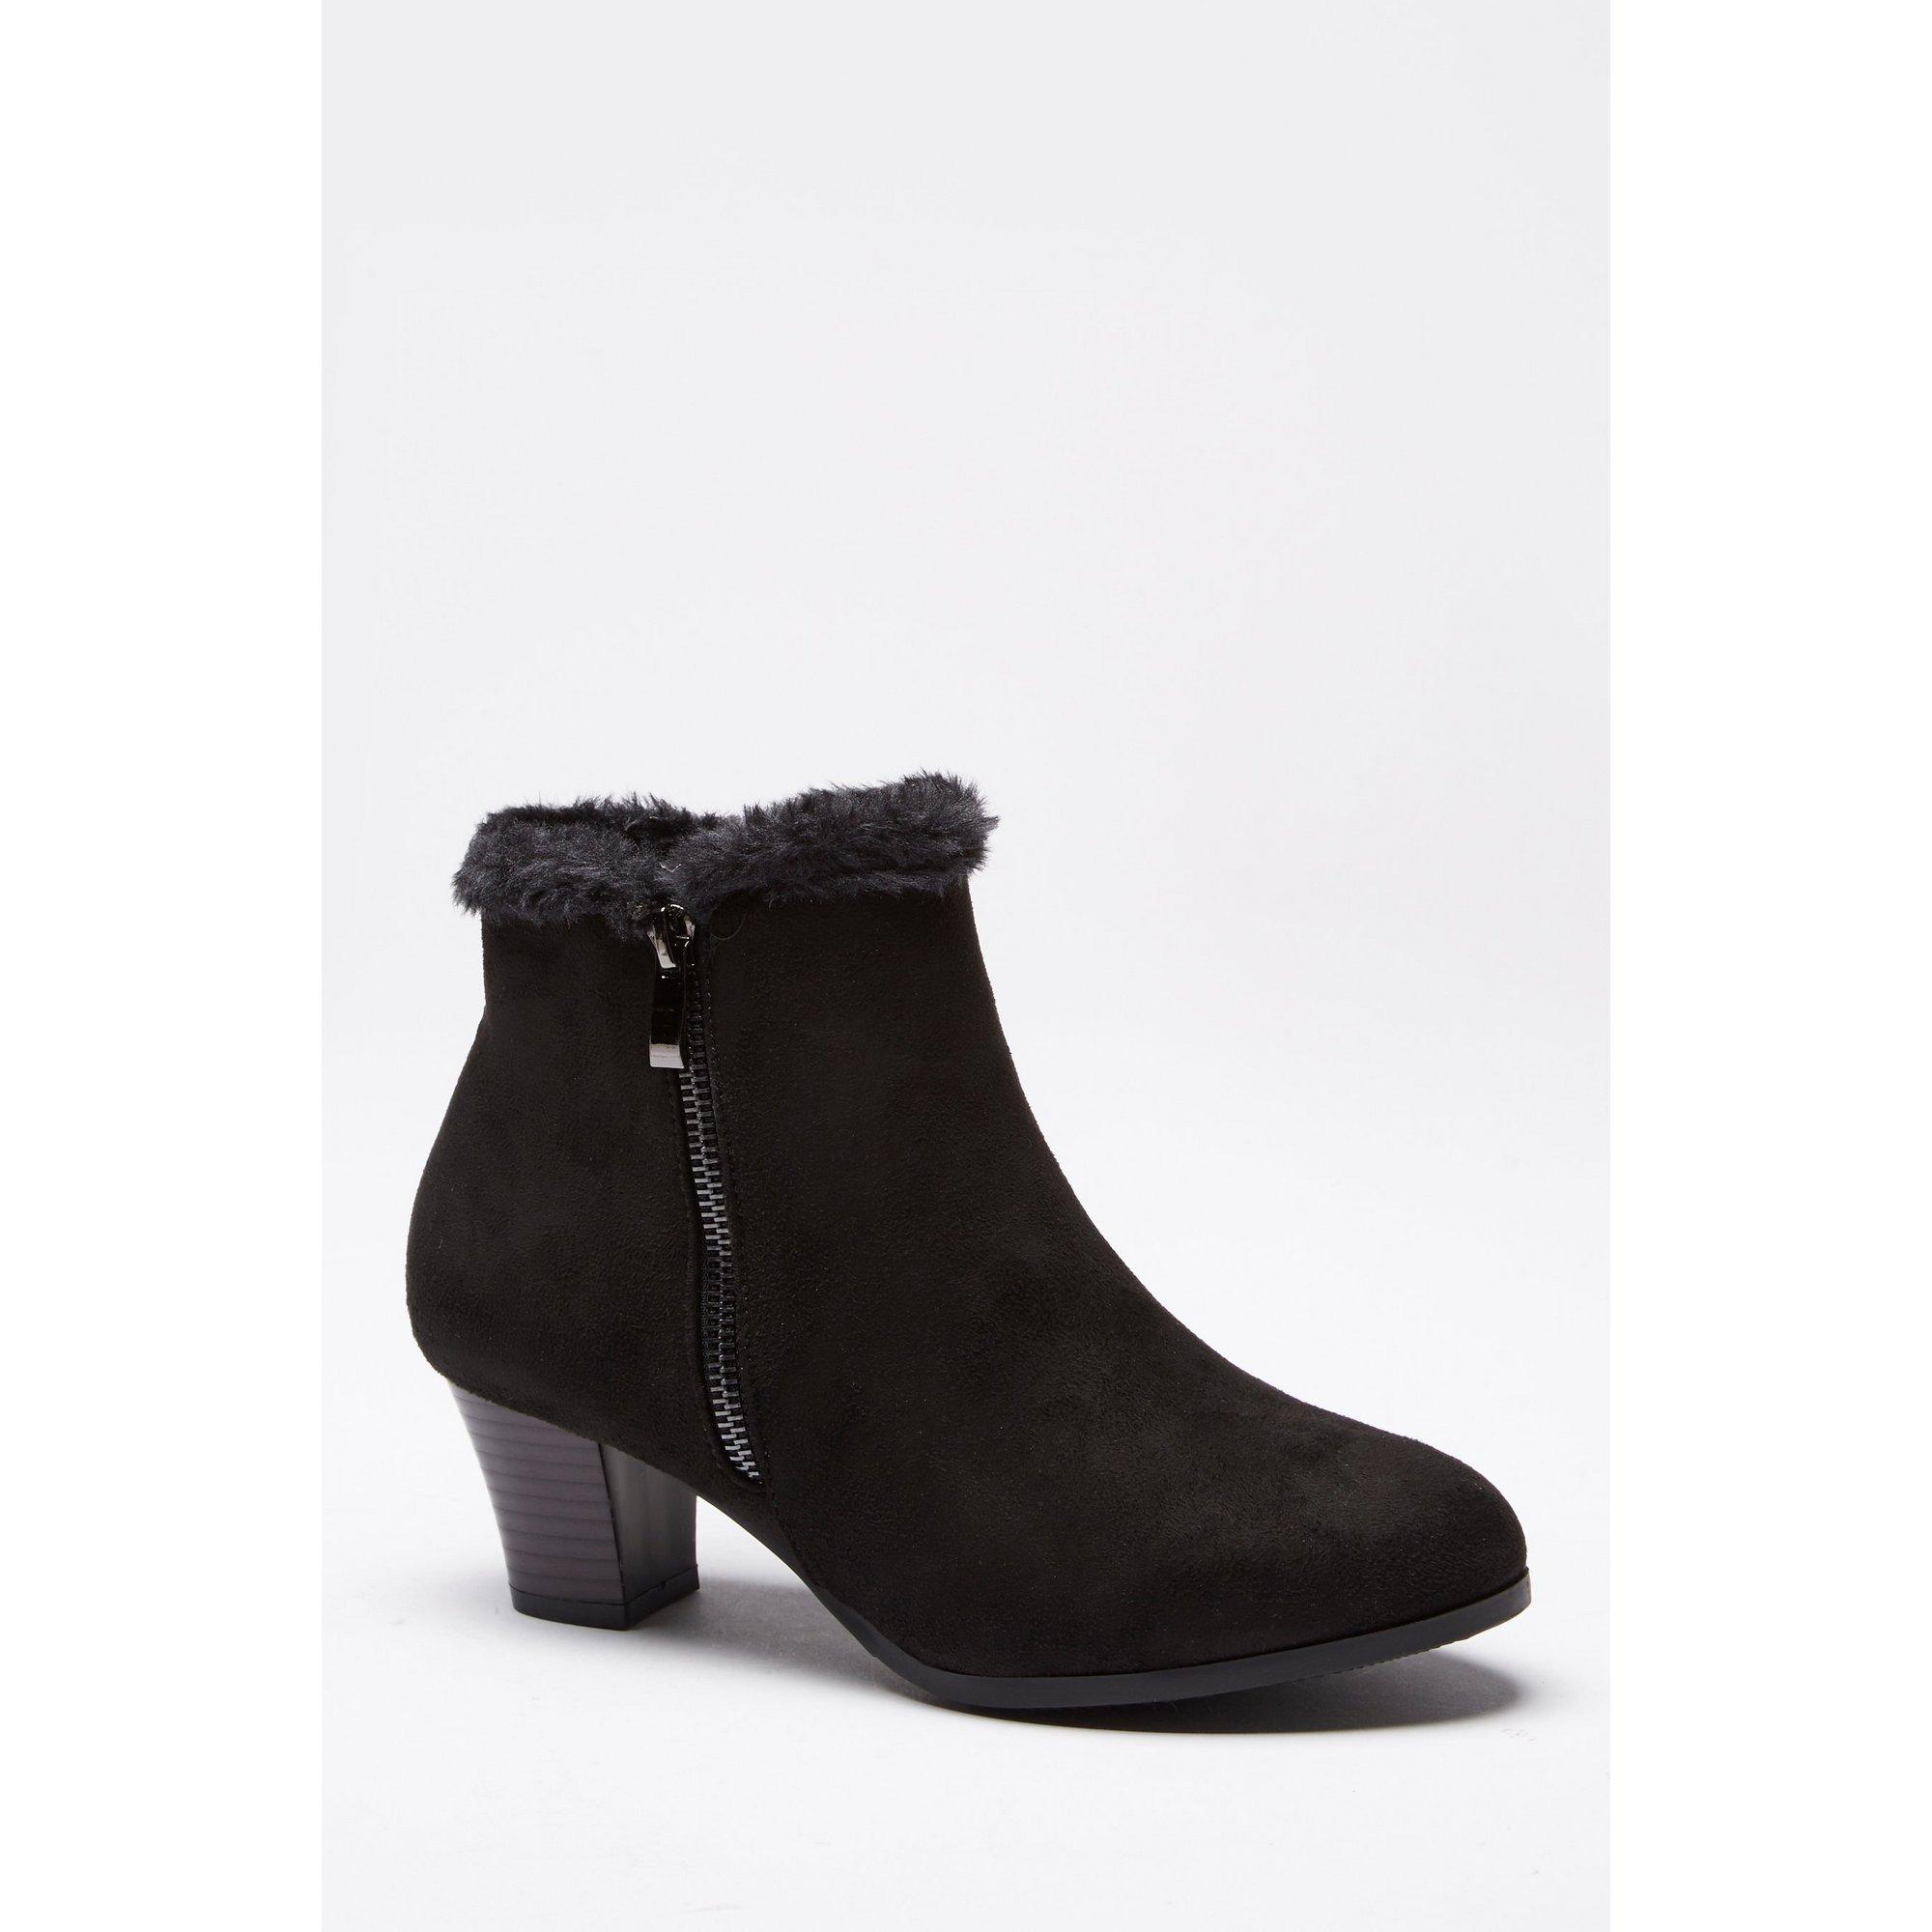 Image of Cushion Walk Faux Suede Fur Trim Zip Boots